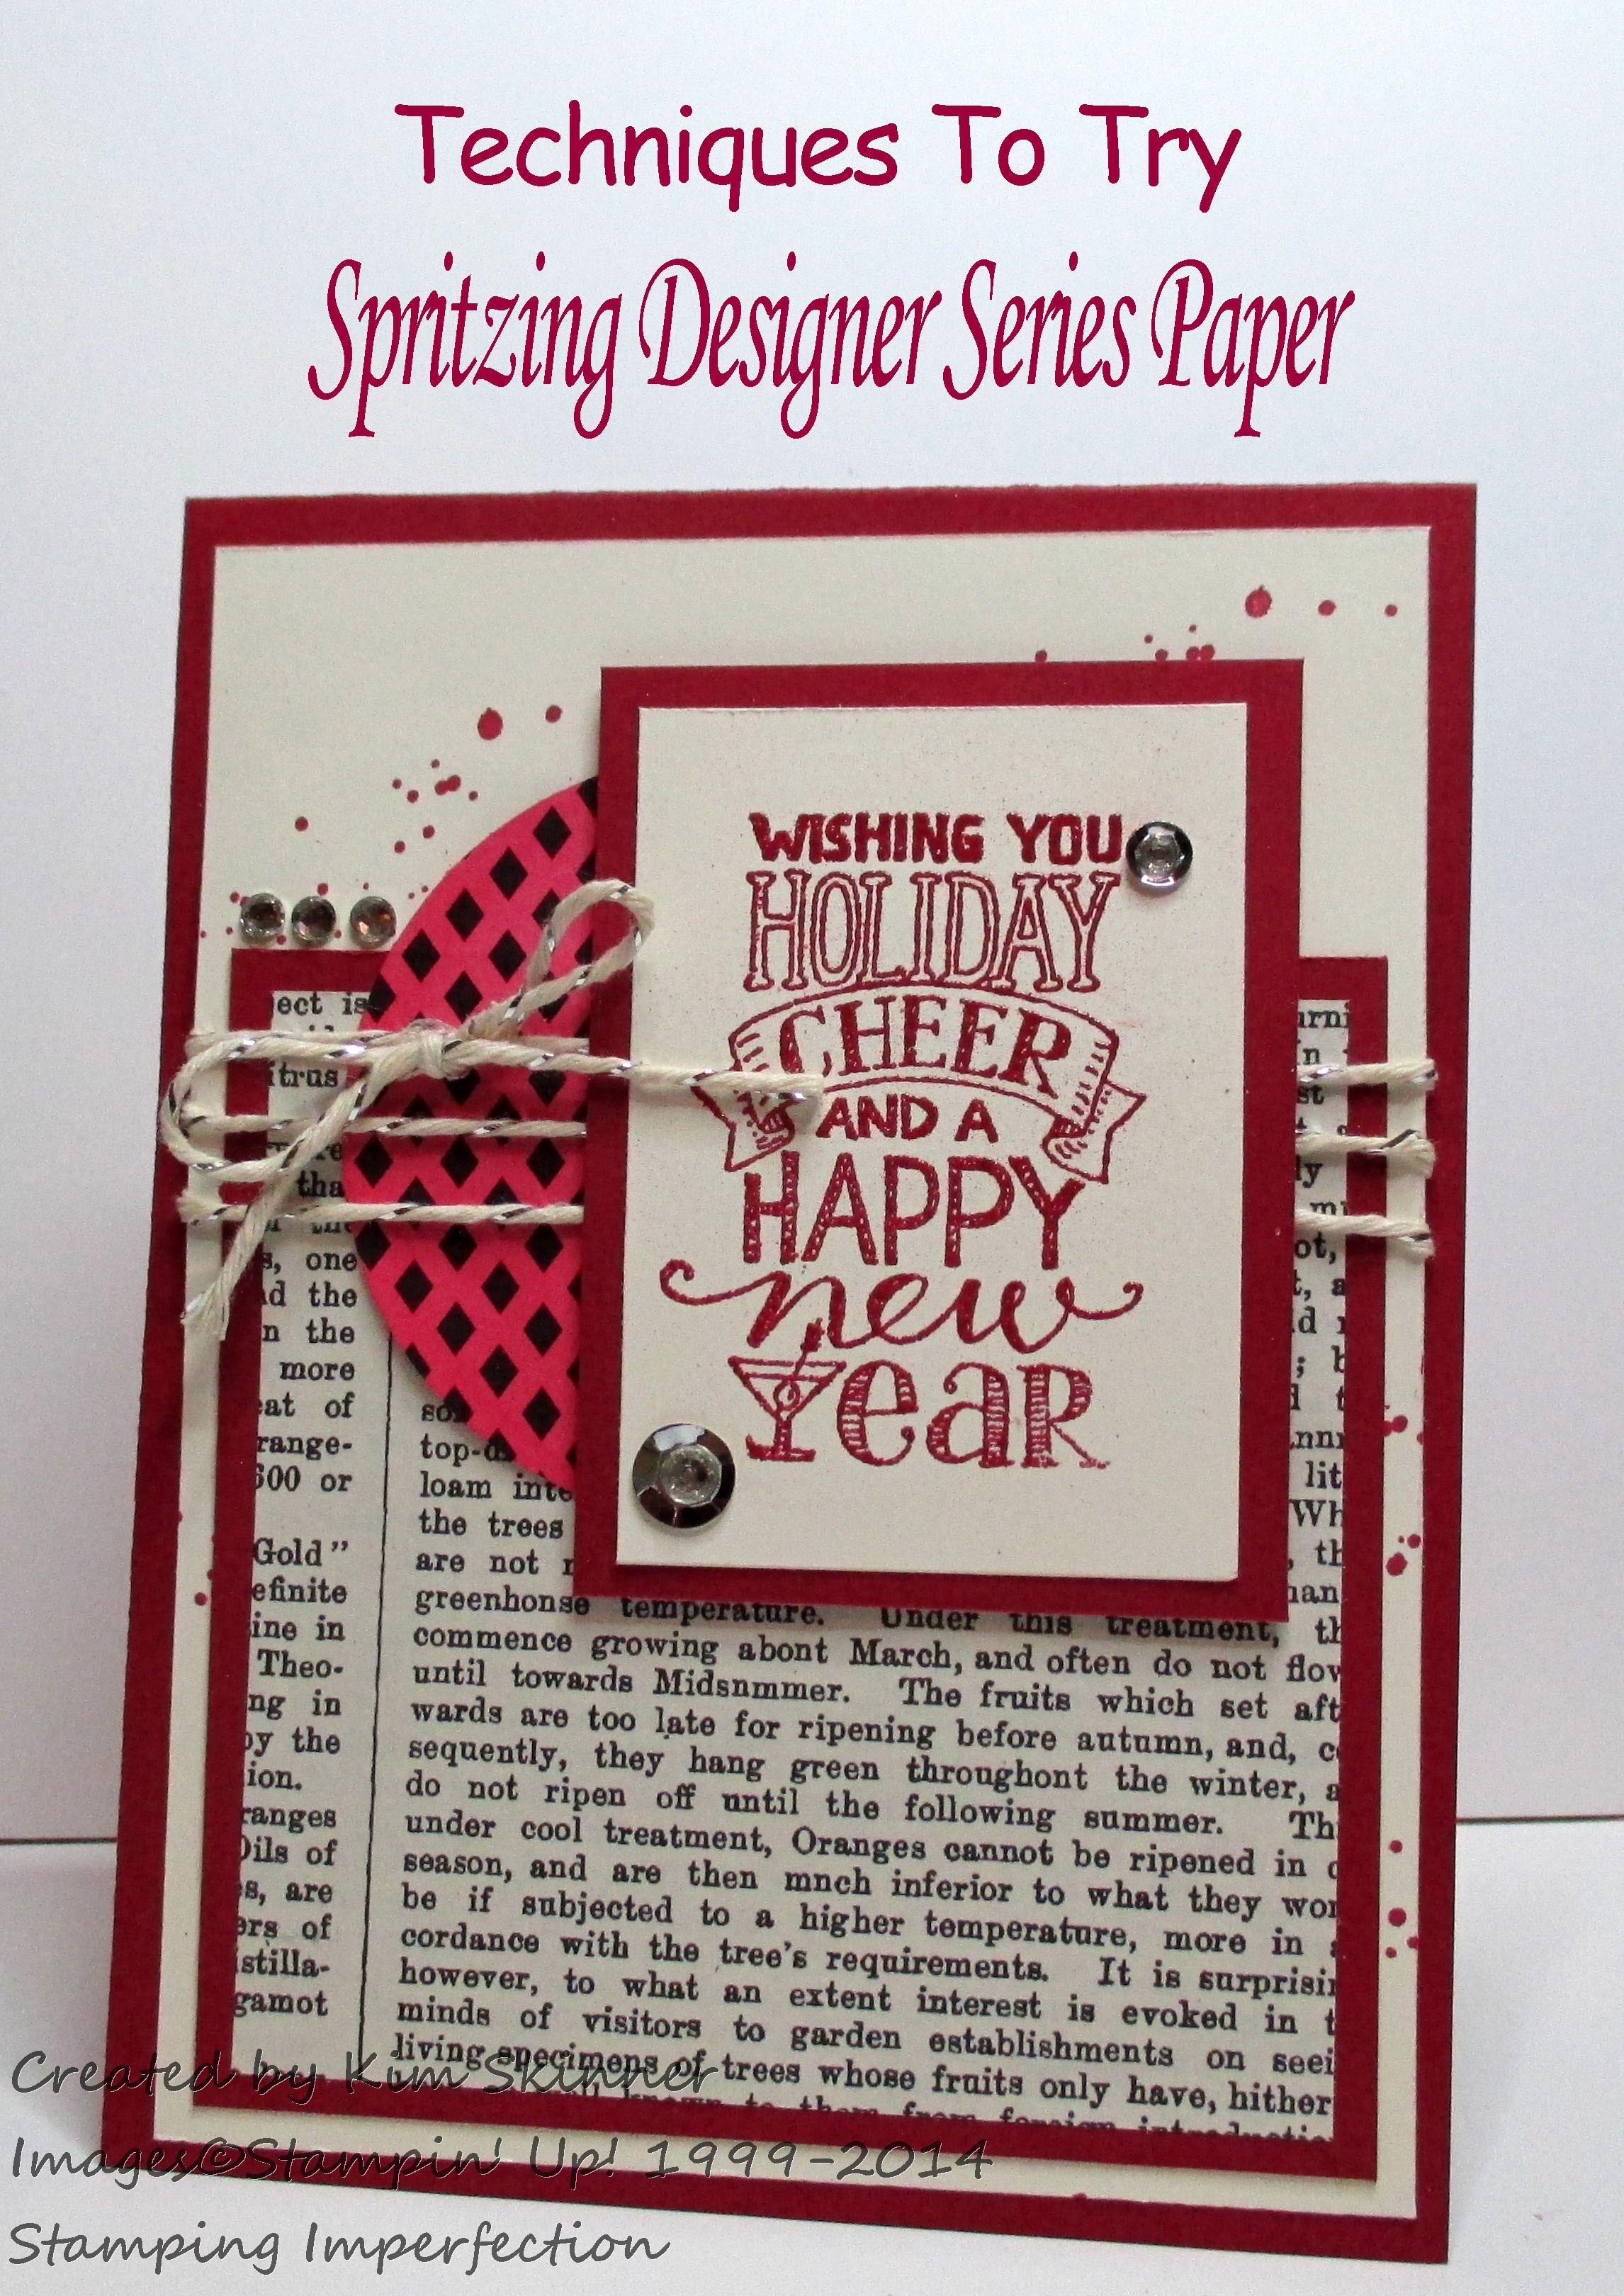 Stamping Imperfection spritzing designer series paper